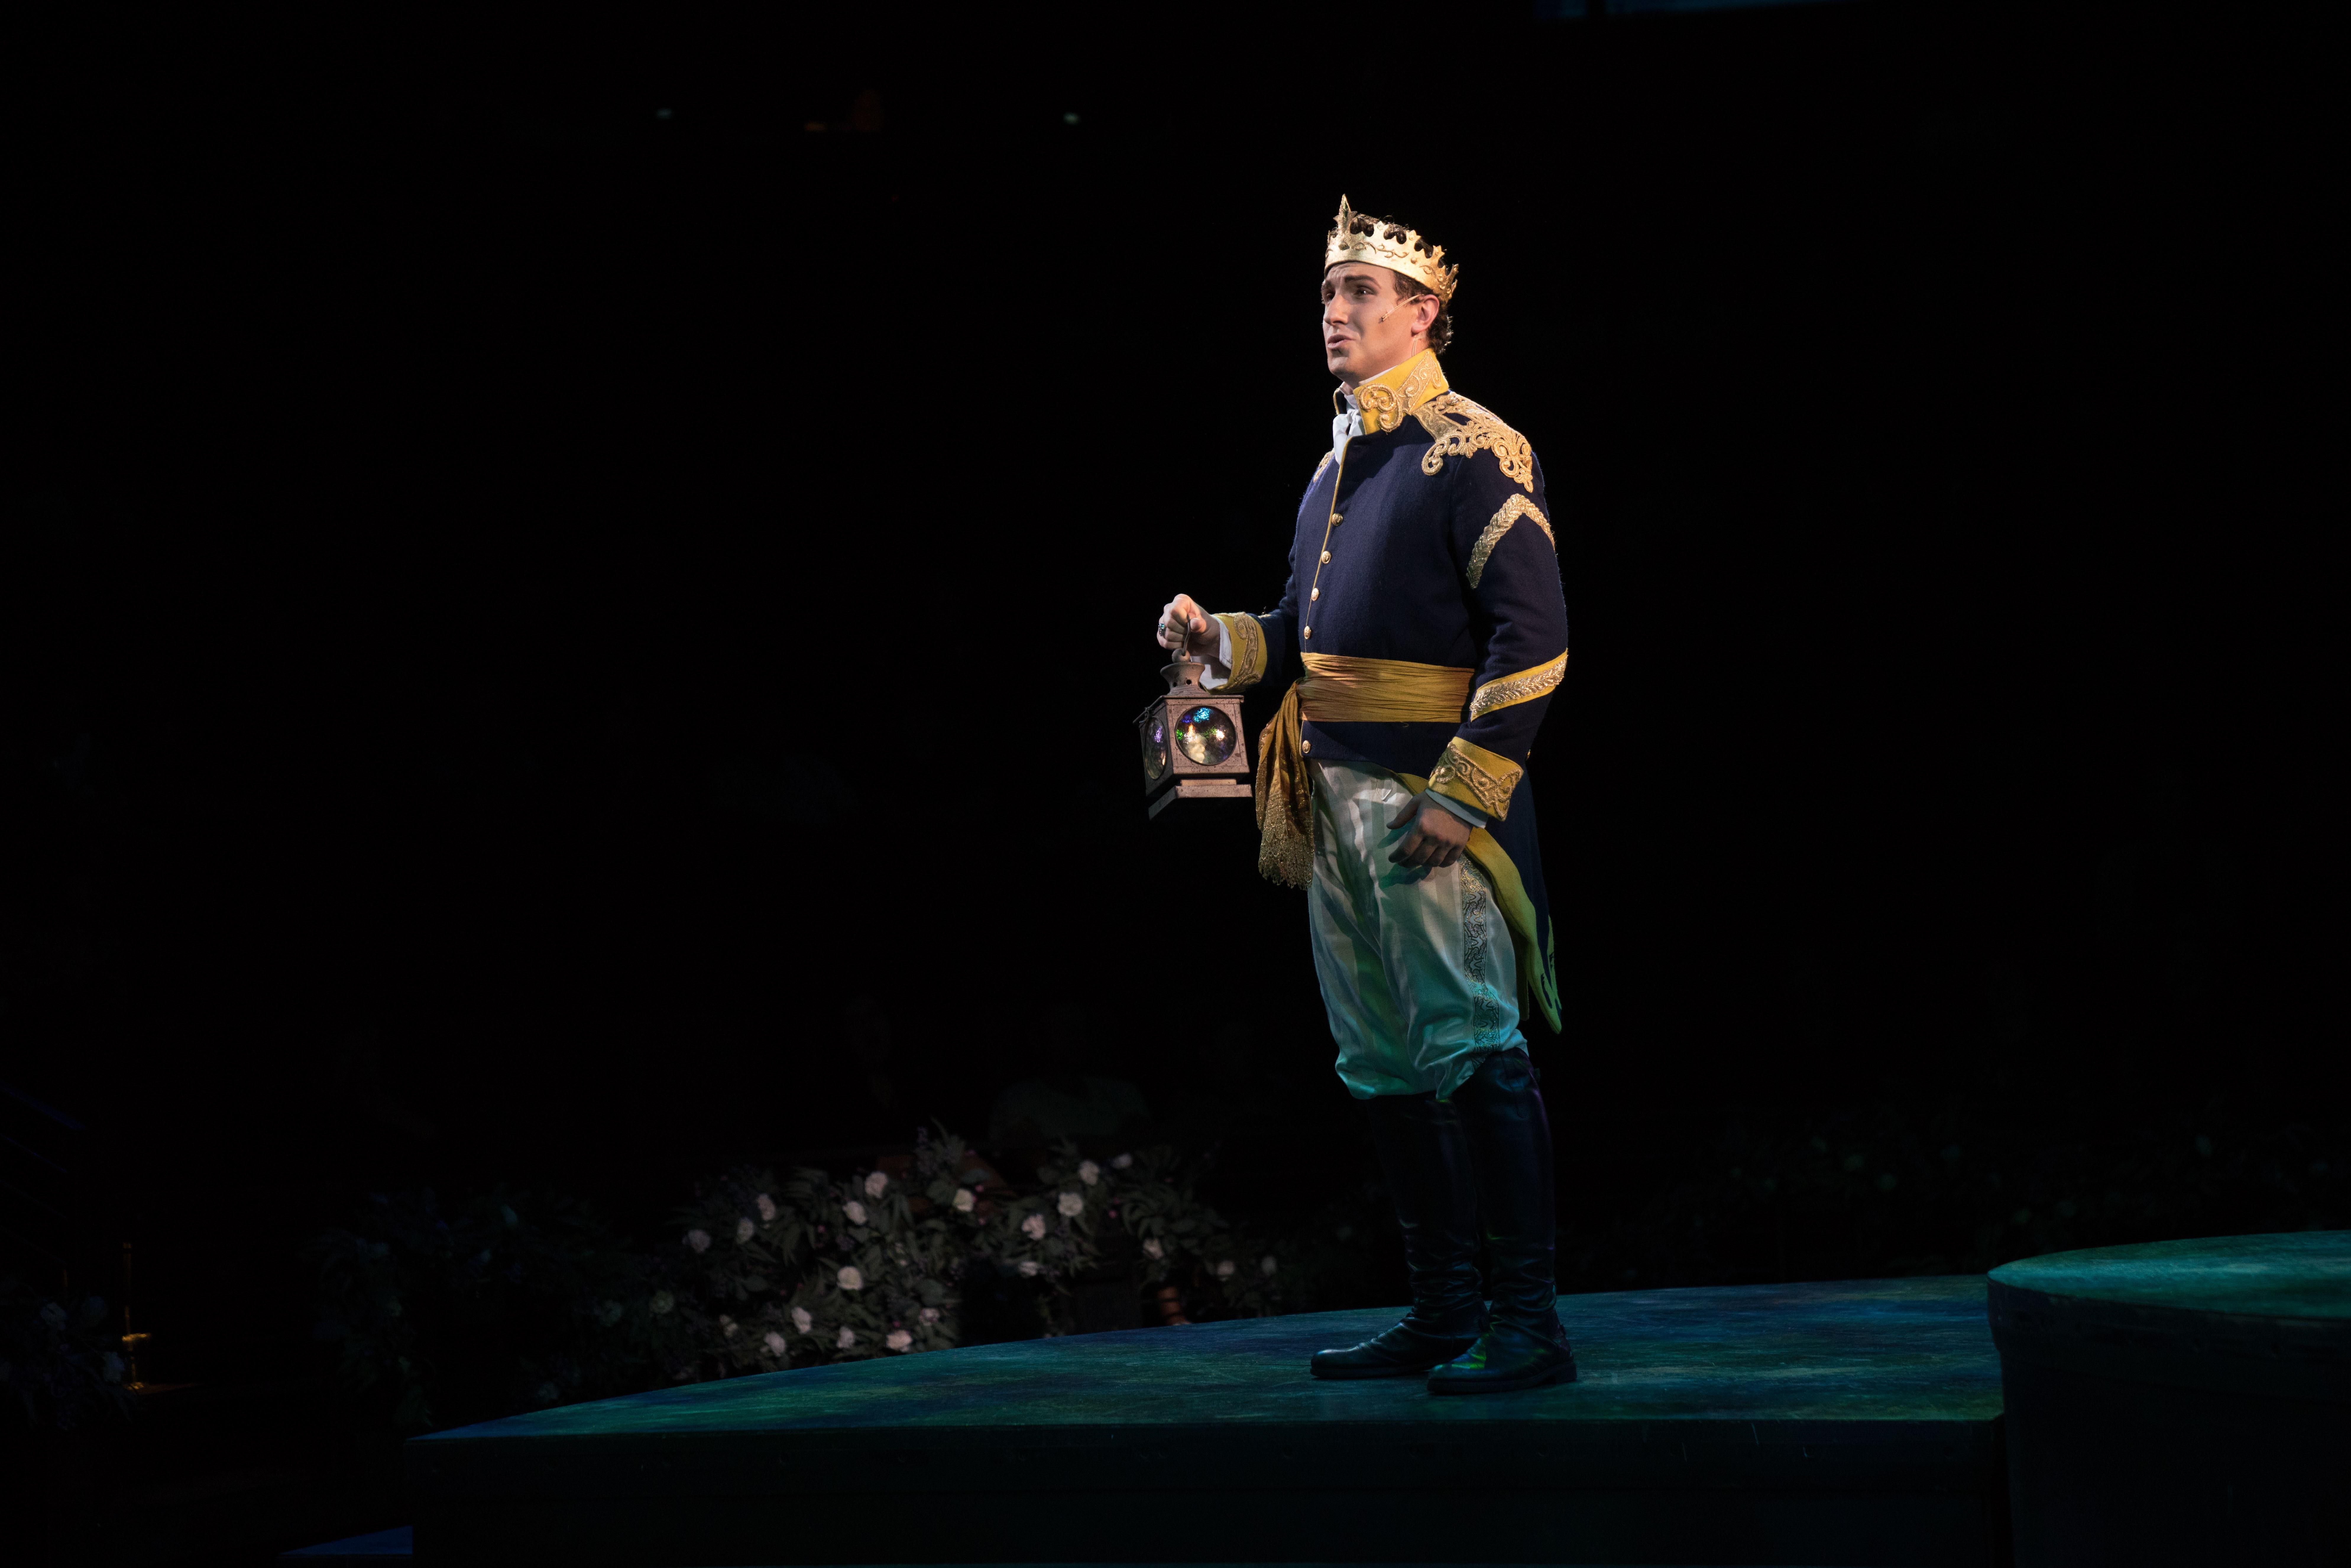 Theater review: Hale Centre Theatre's 'Cinderella' looks